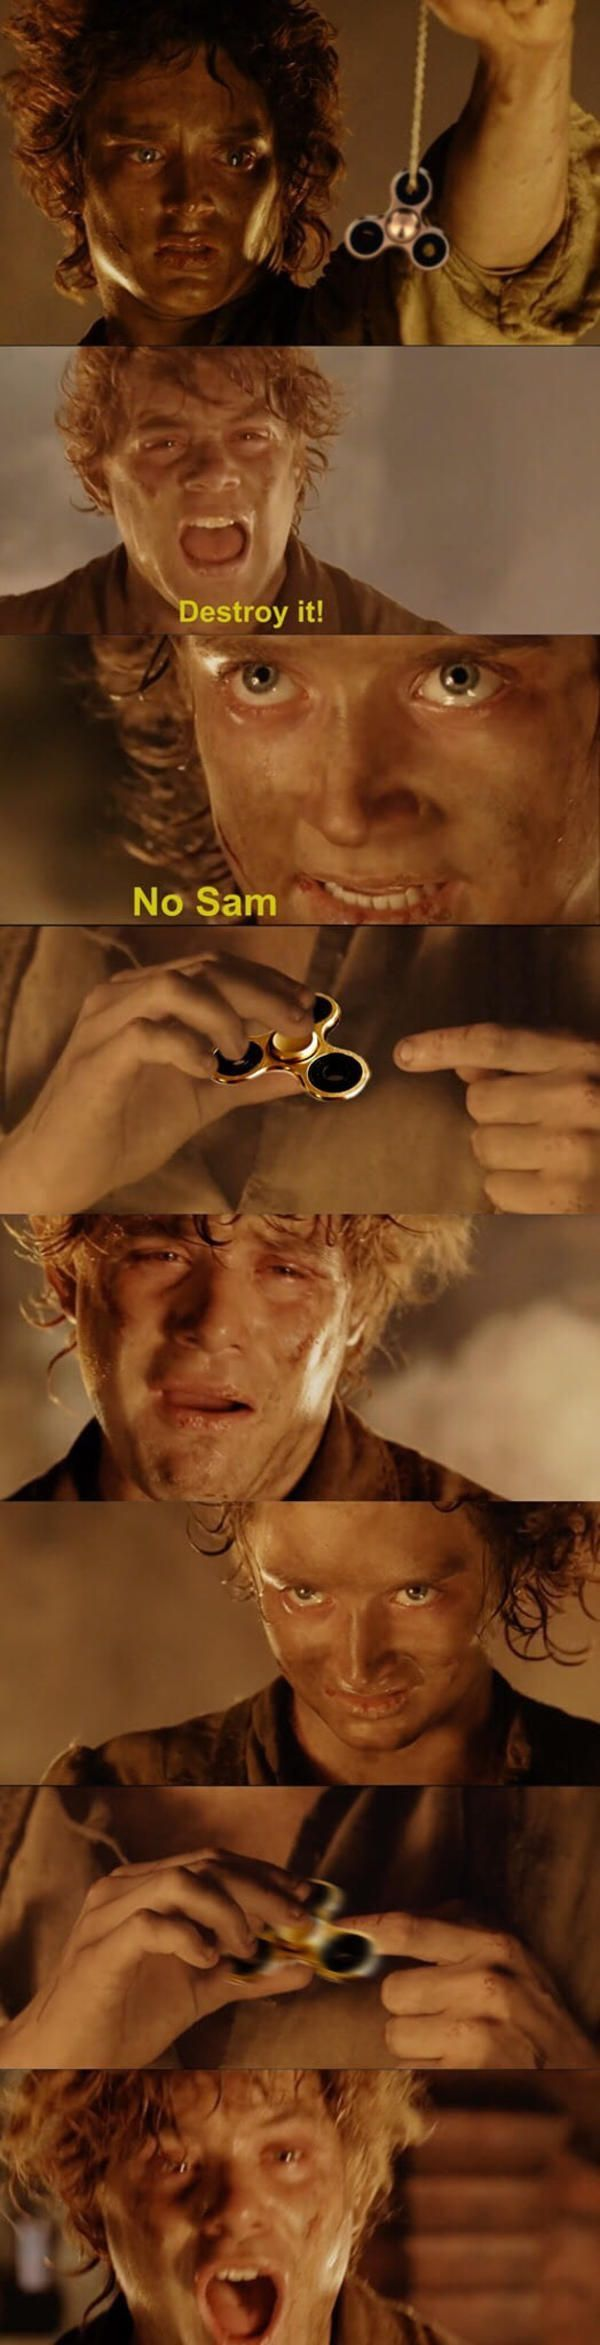 "XD lolololol ""THE SPINNER IS MINE!!!!!!!?""-Frodo   ""NOOOOOOO"" -Sam"